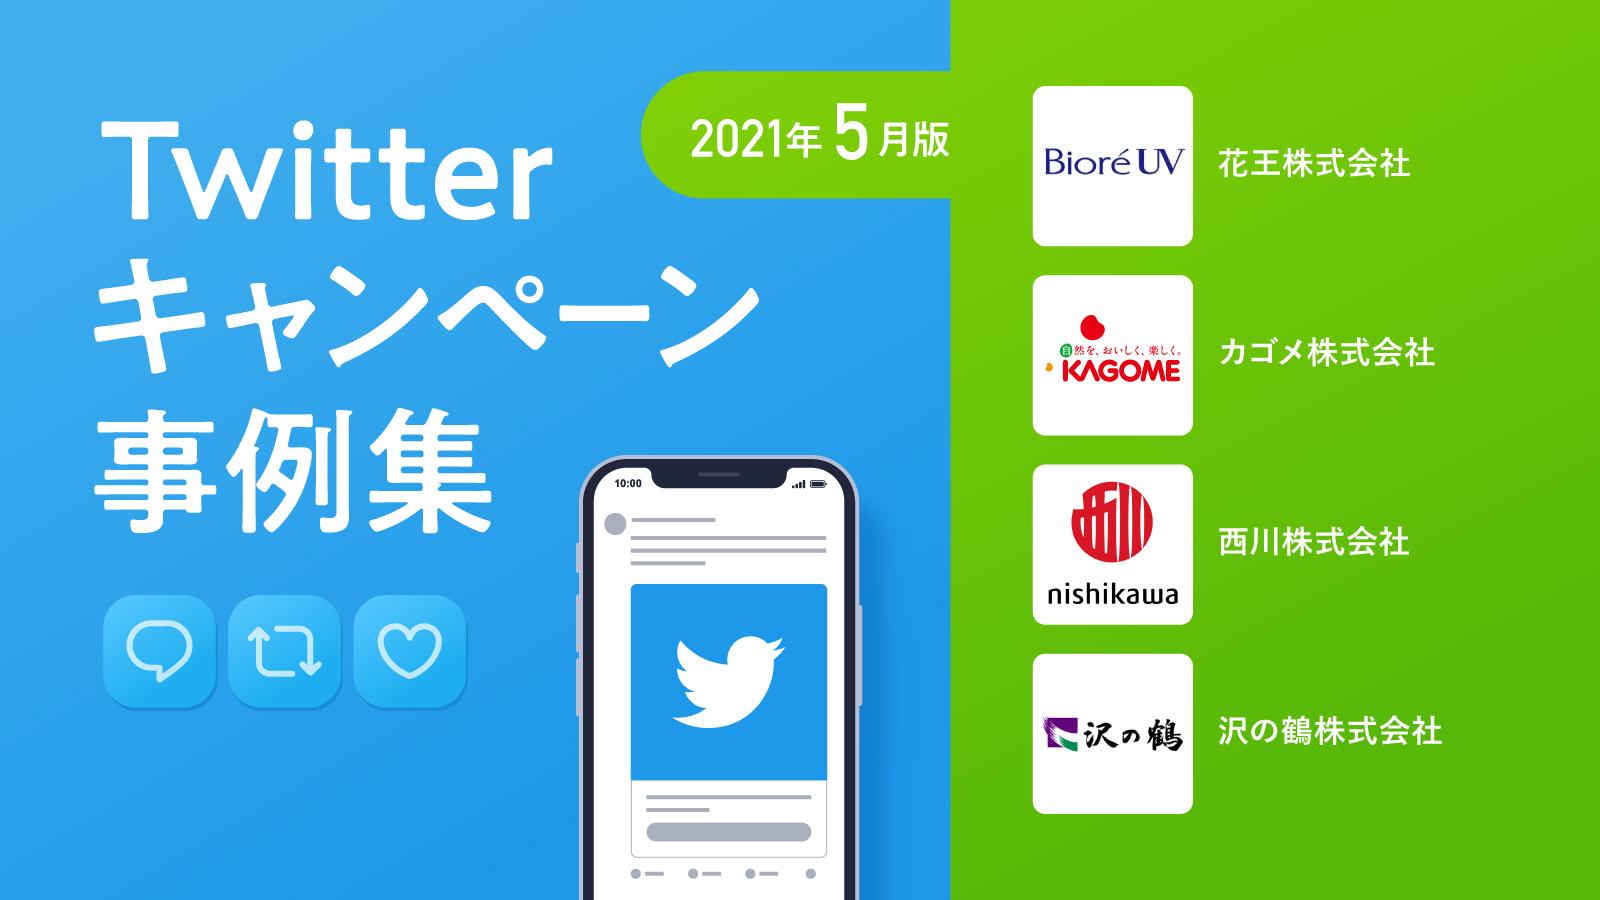 Twitterキャンペーン事例集5月版